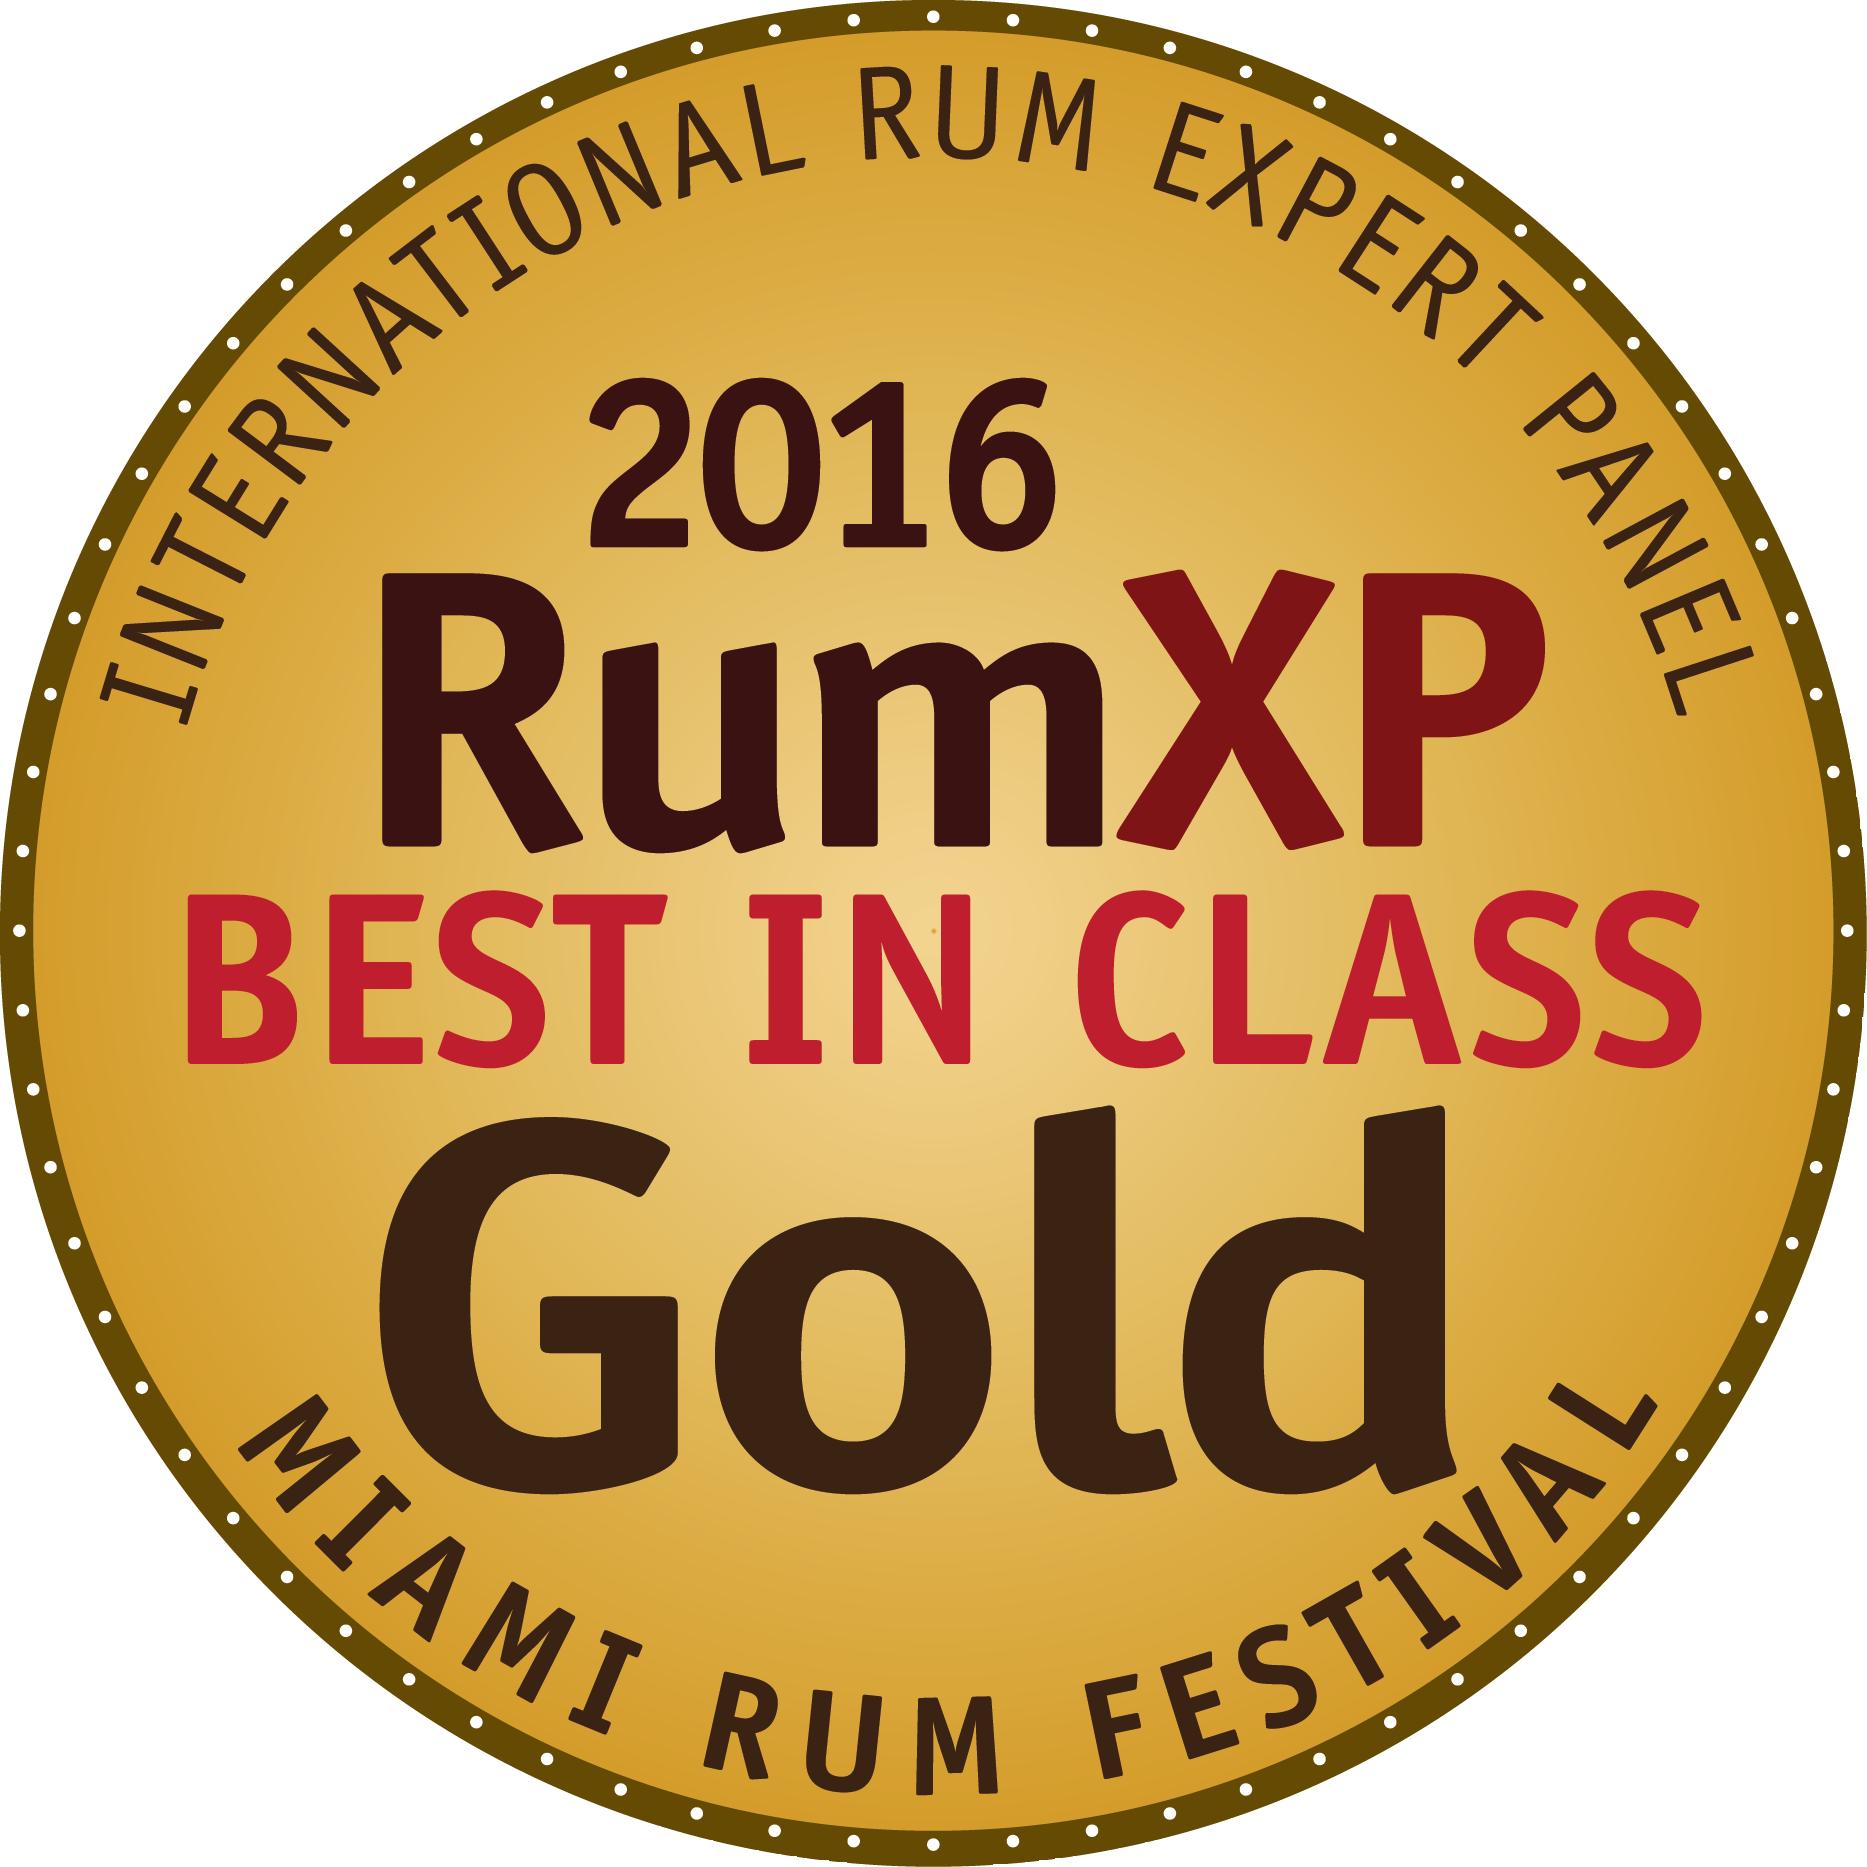 XO 20th Anniversary : RumXP Miami 2016, Gold Medal Best in Class, US